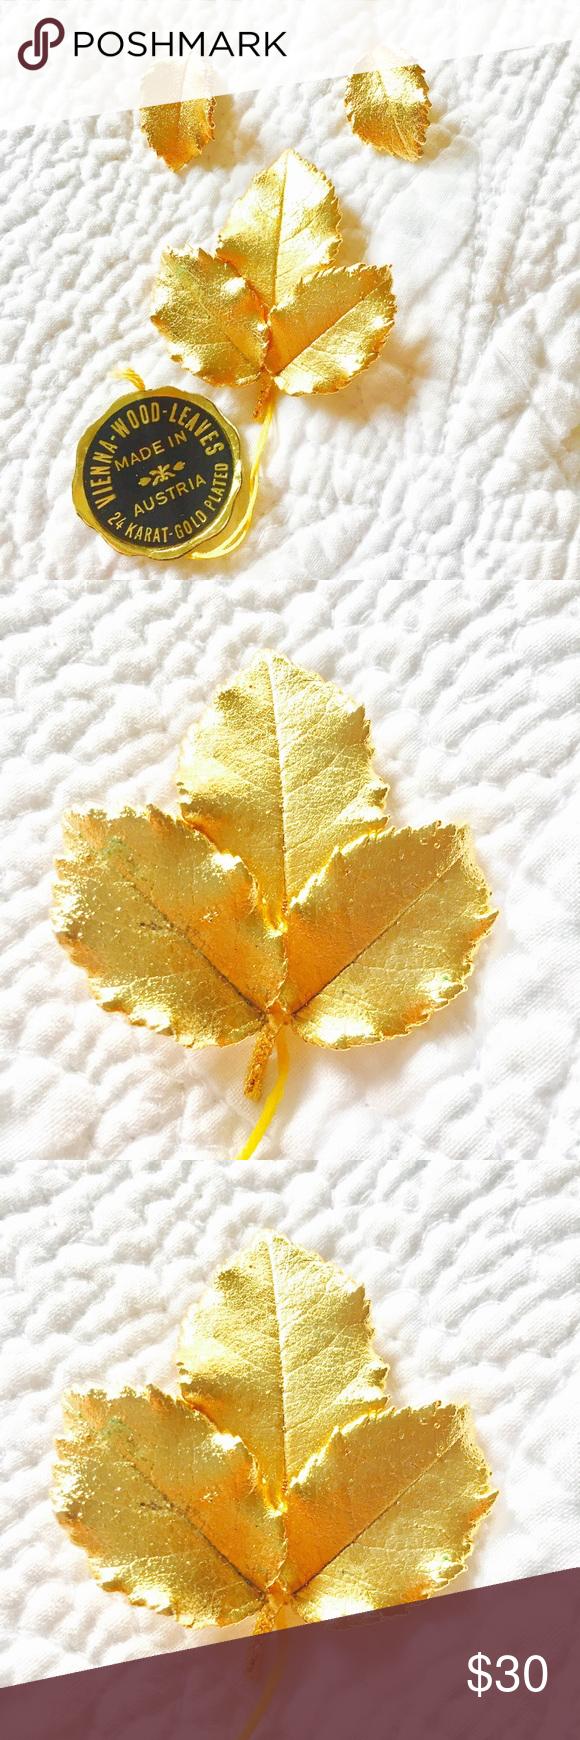 Vintage Vienna Made brooch hallmarked pendant 24kt Gold Plate Leaf gold finish Made in Austria